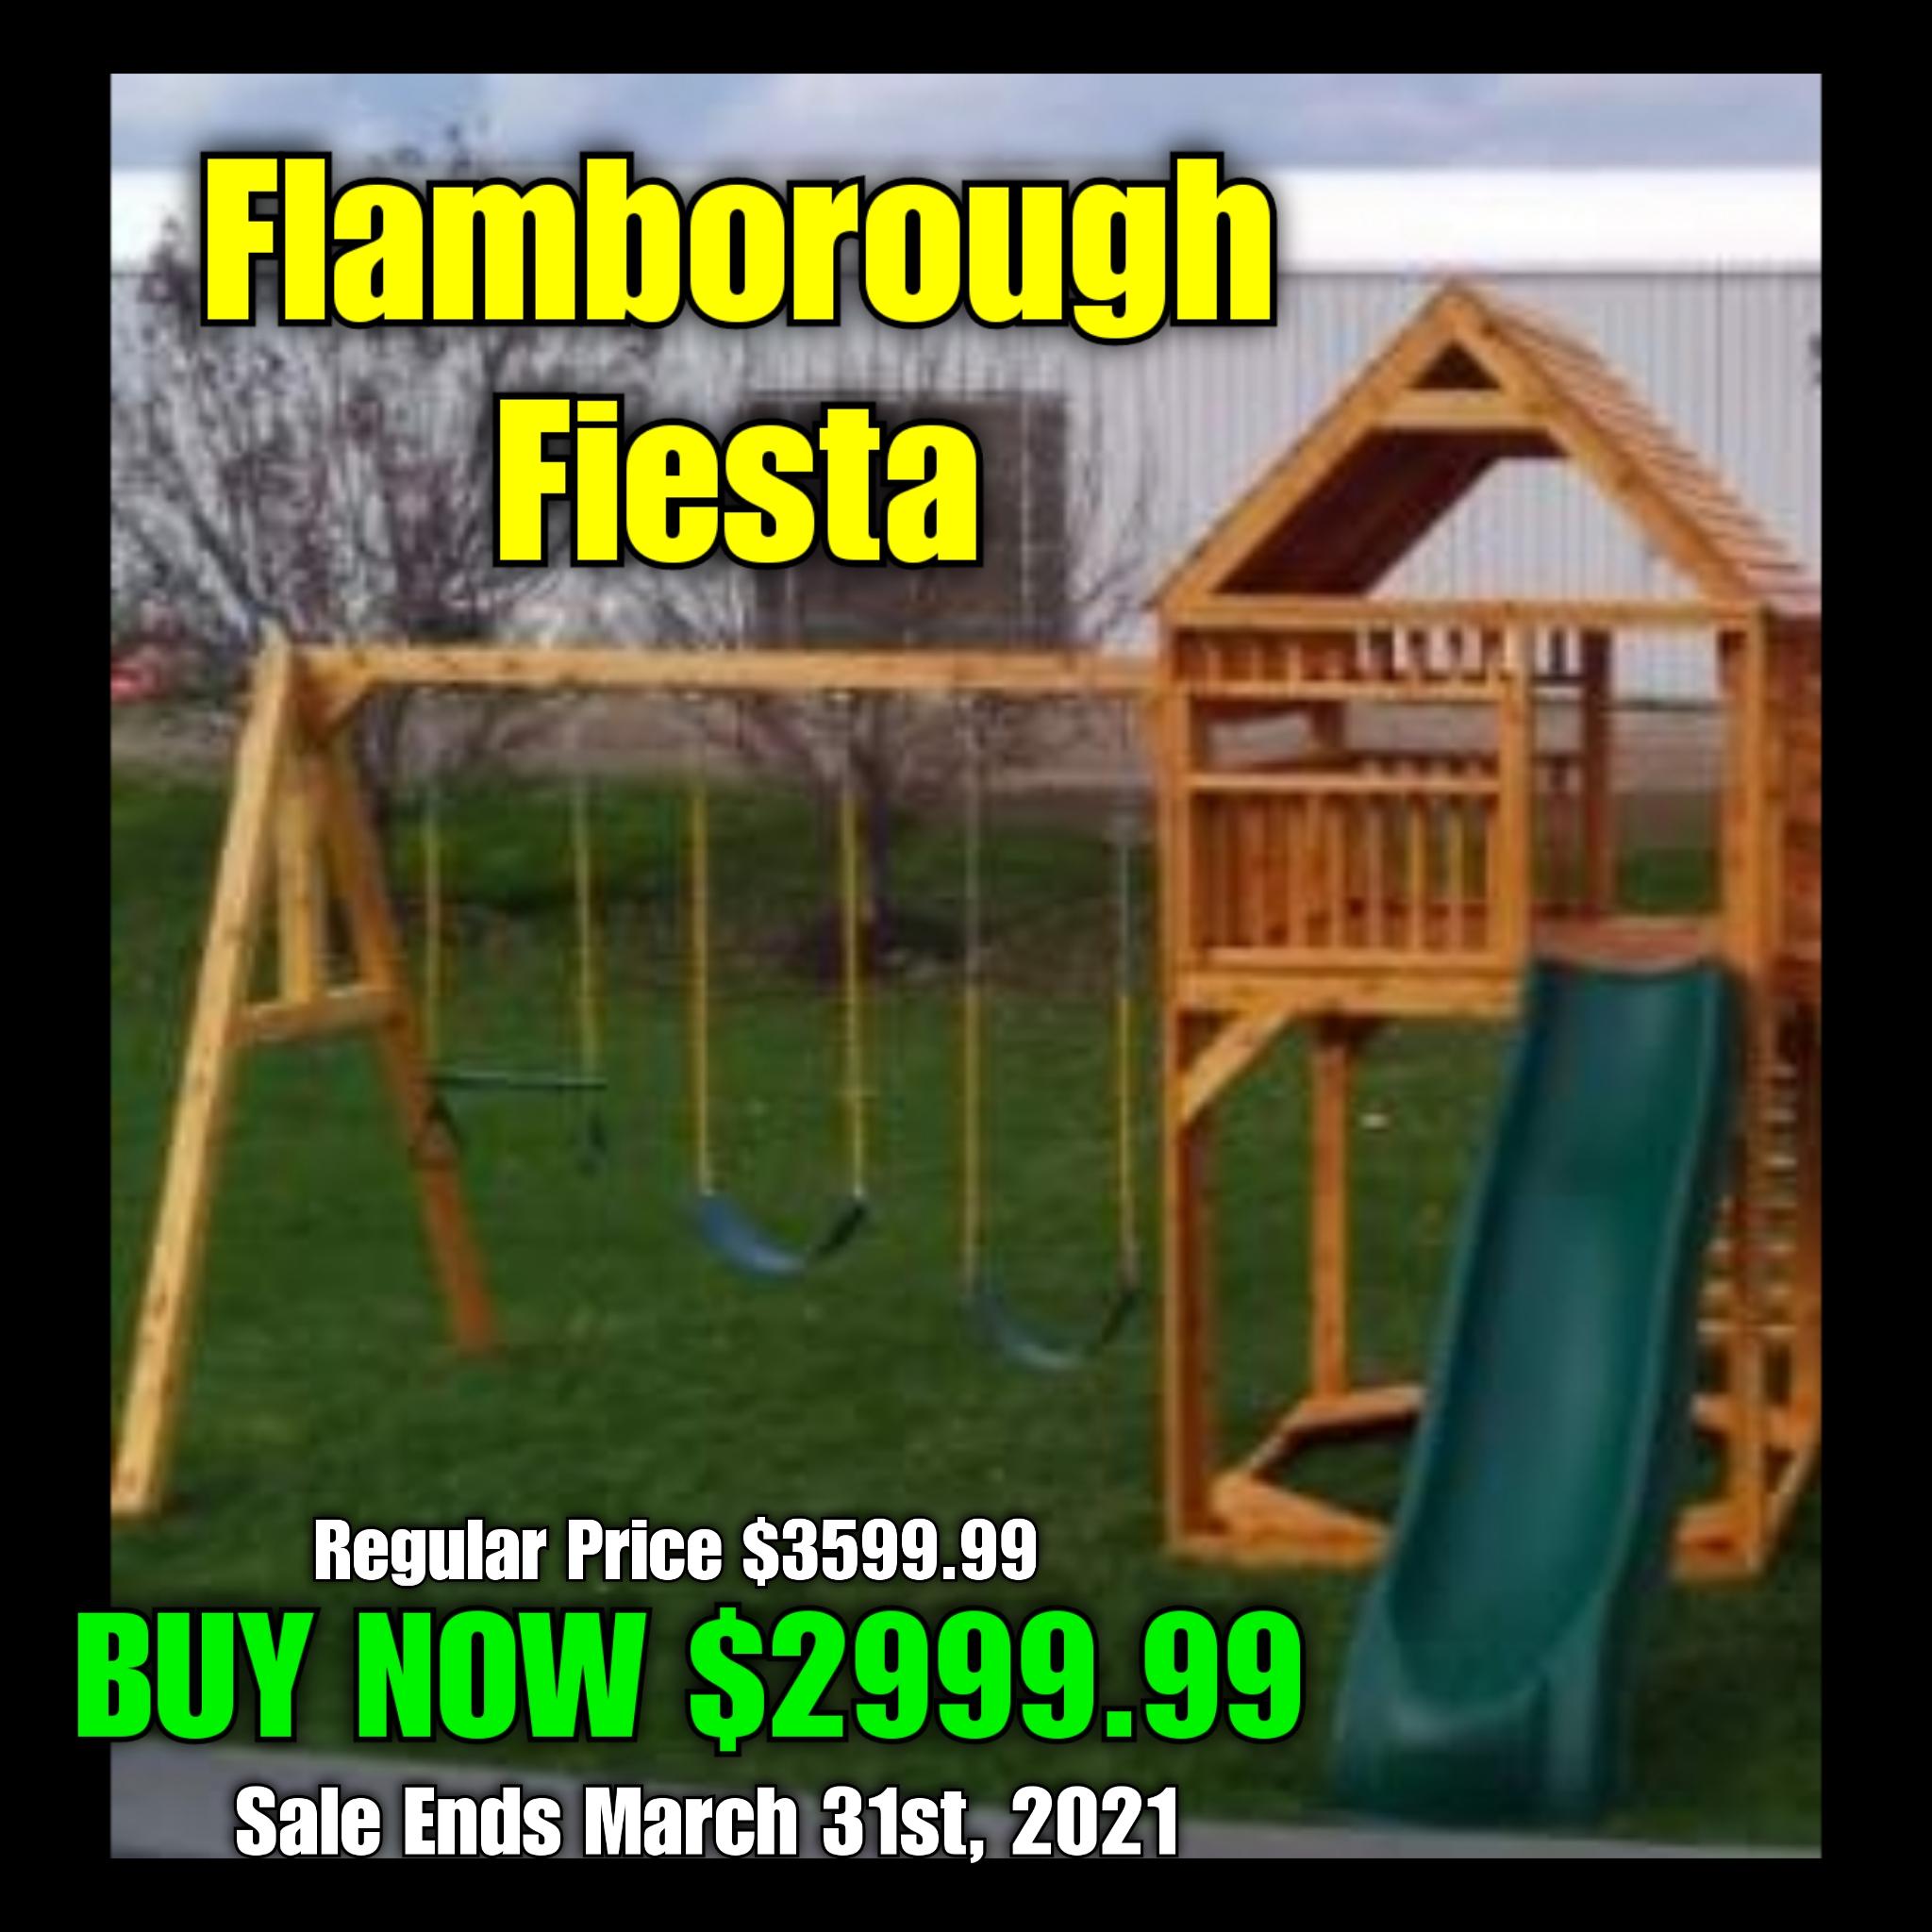 Flamborough Fiesta Sale Pic